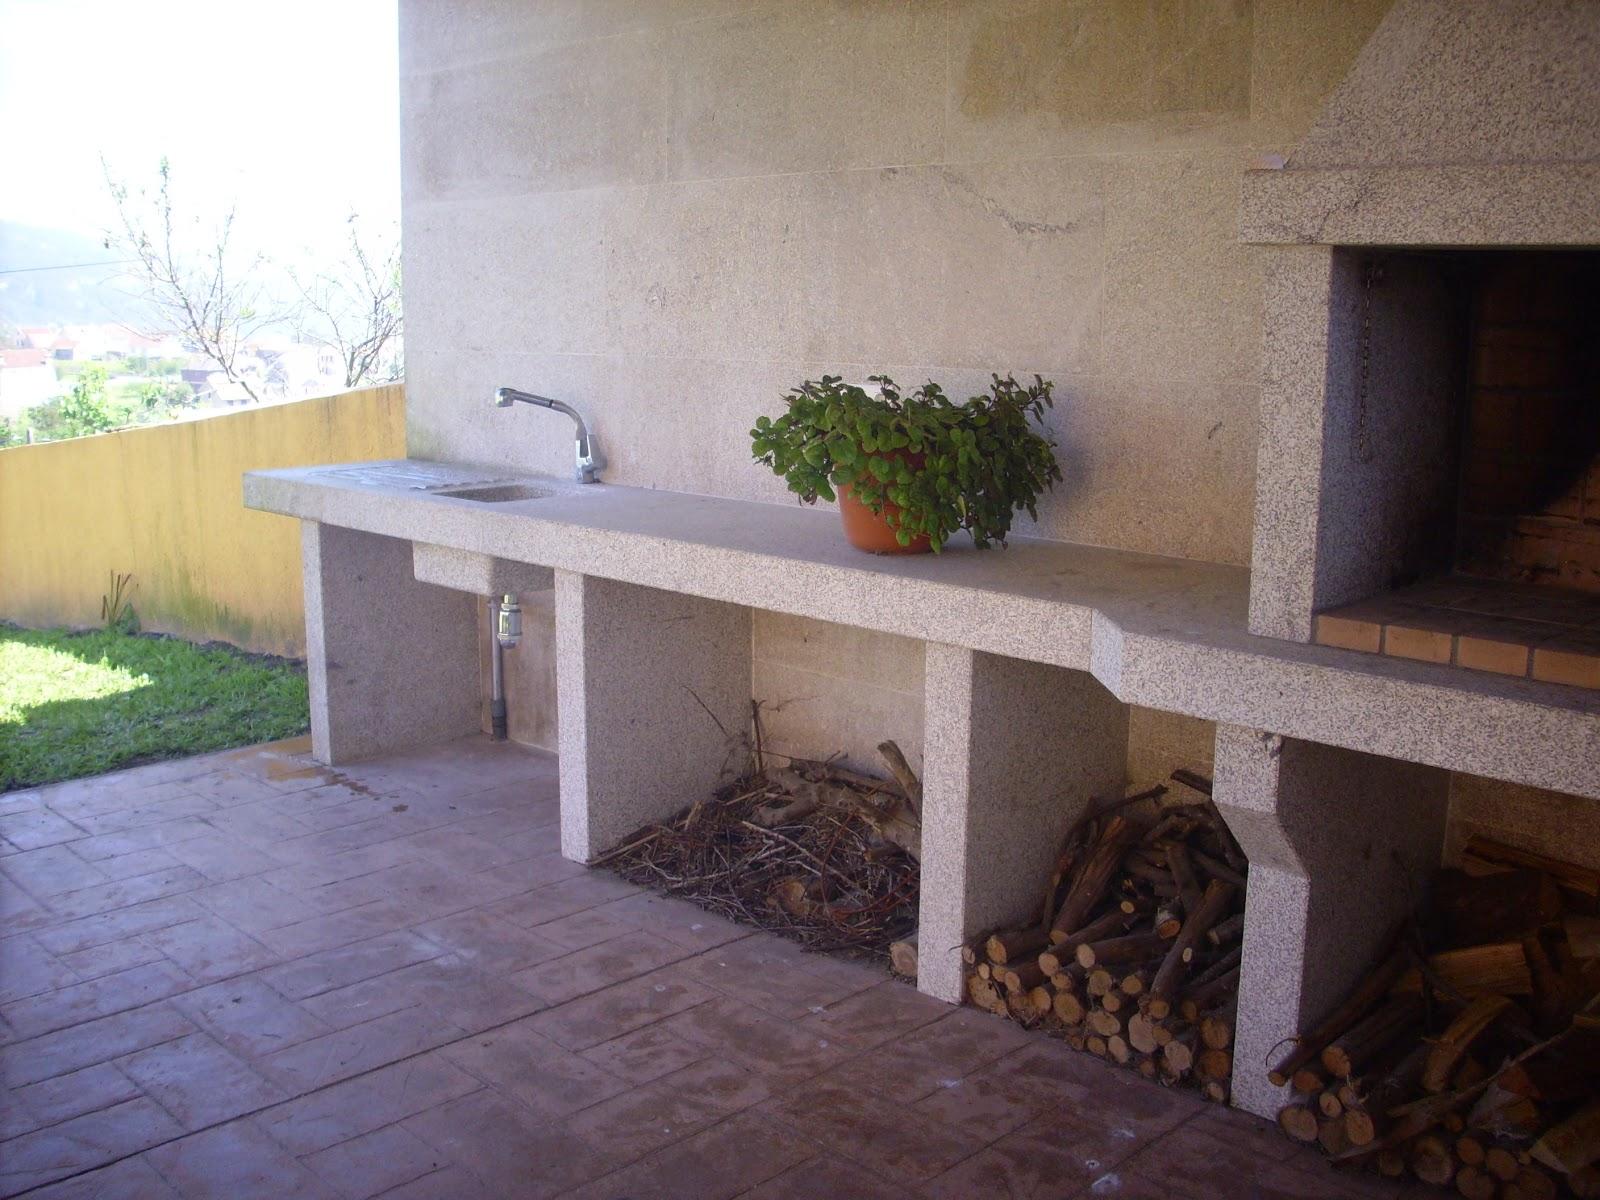 Caeiroc canteria asadores barbacoas lareiras chimeneas - Piedras para chimeneas ...